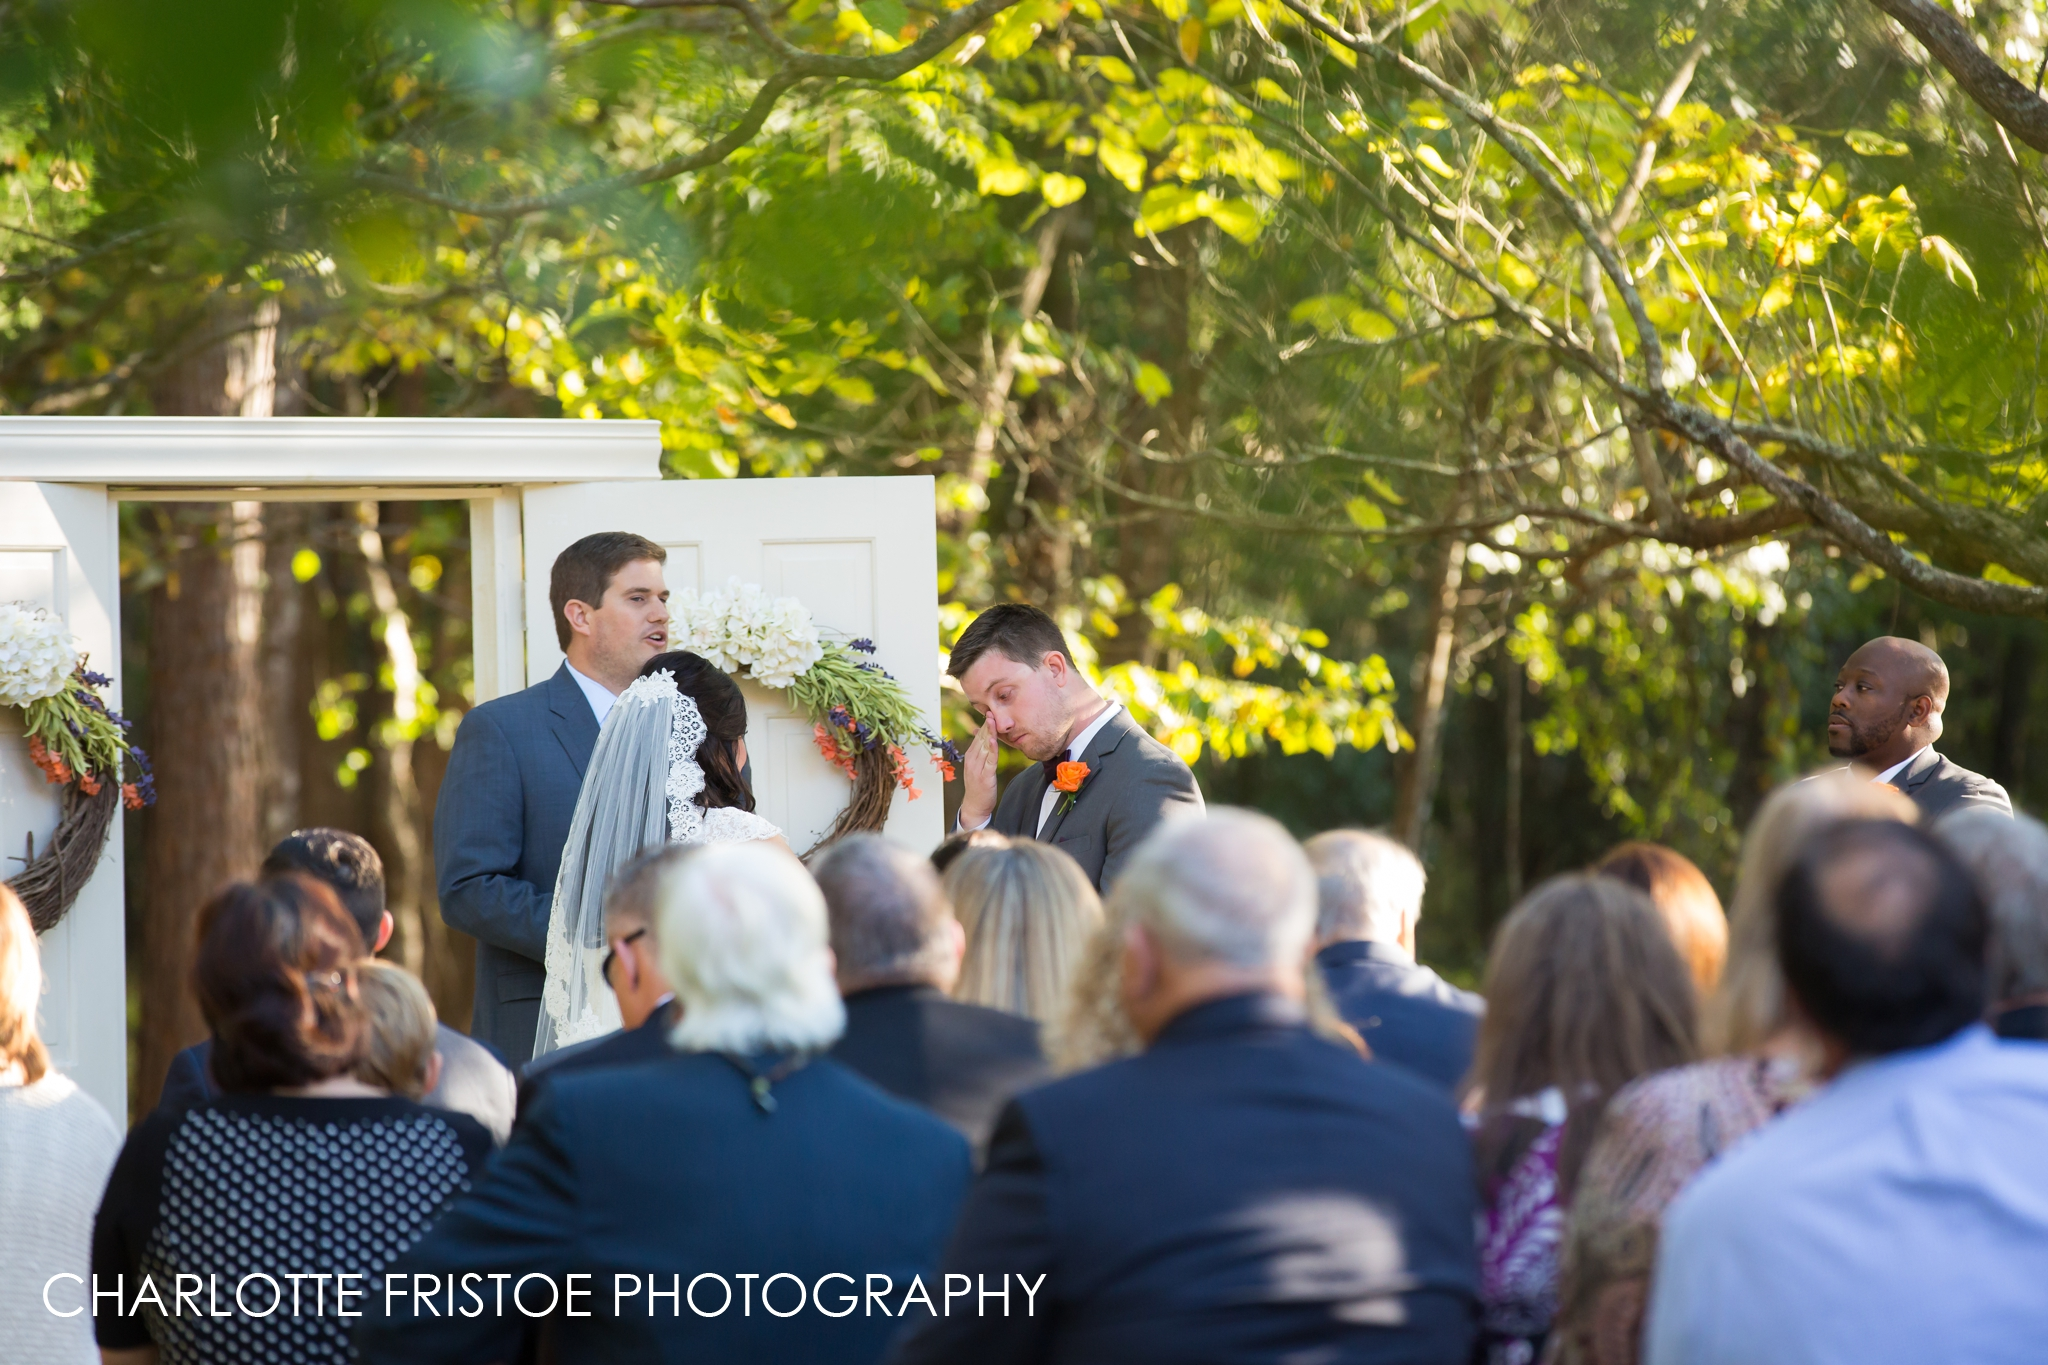 Lake Iamonia Wedding Charlotte Fristoe Photography-37.jpg